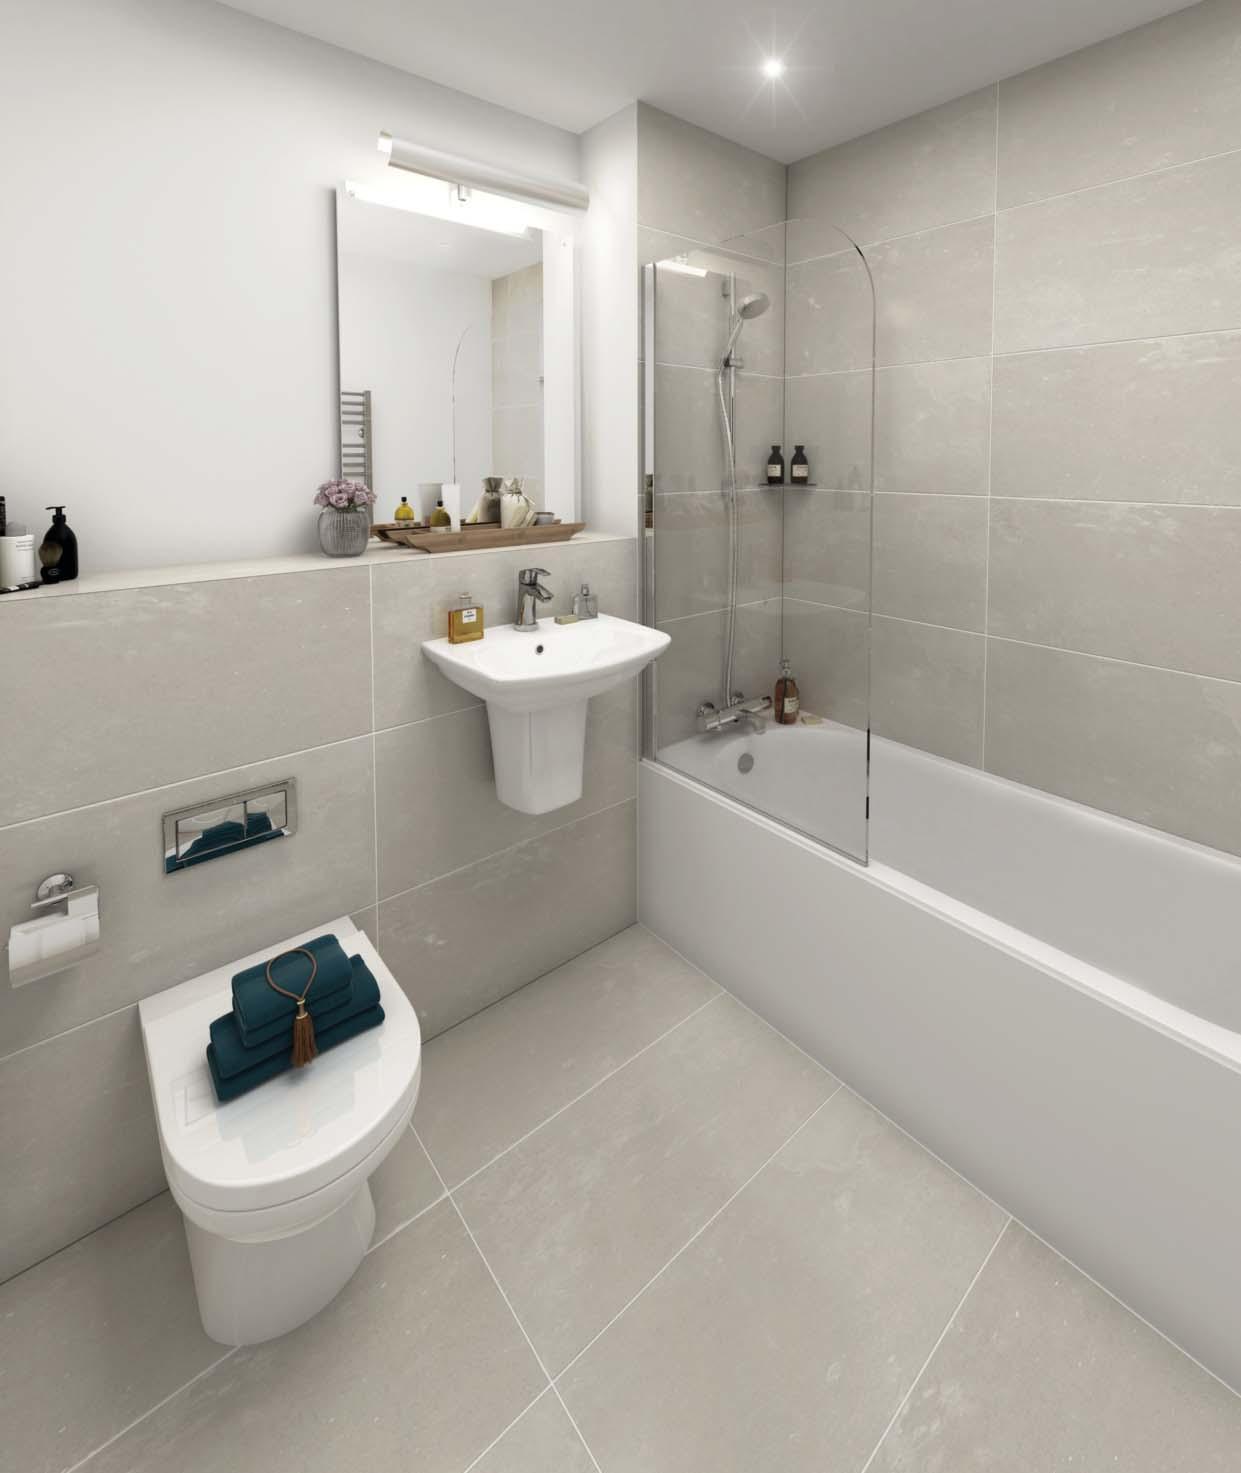 http://investinplc.com/wp-content/uploads/2017/01/bathroom.jpg